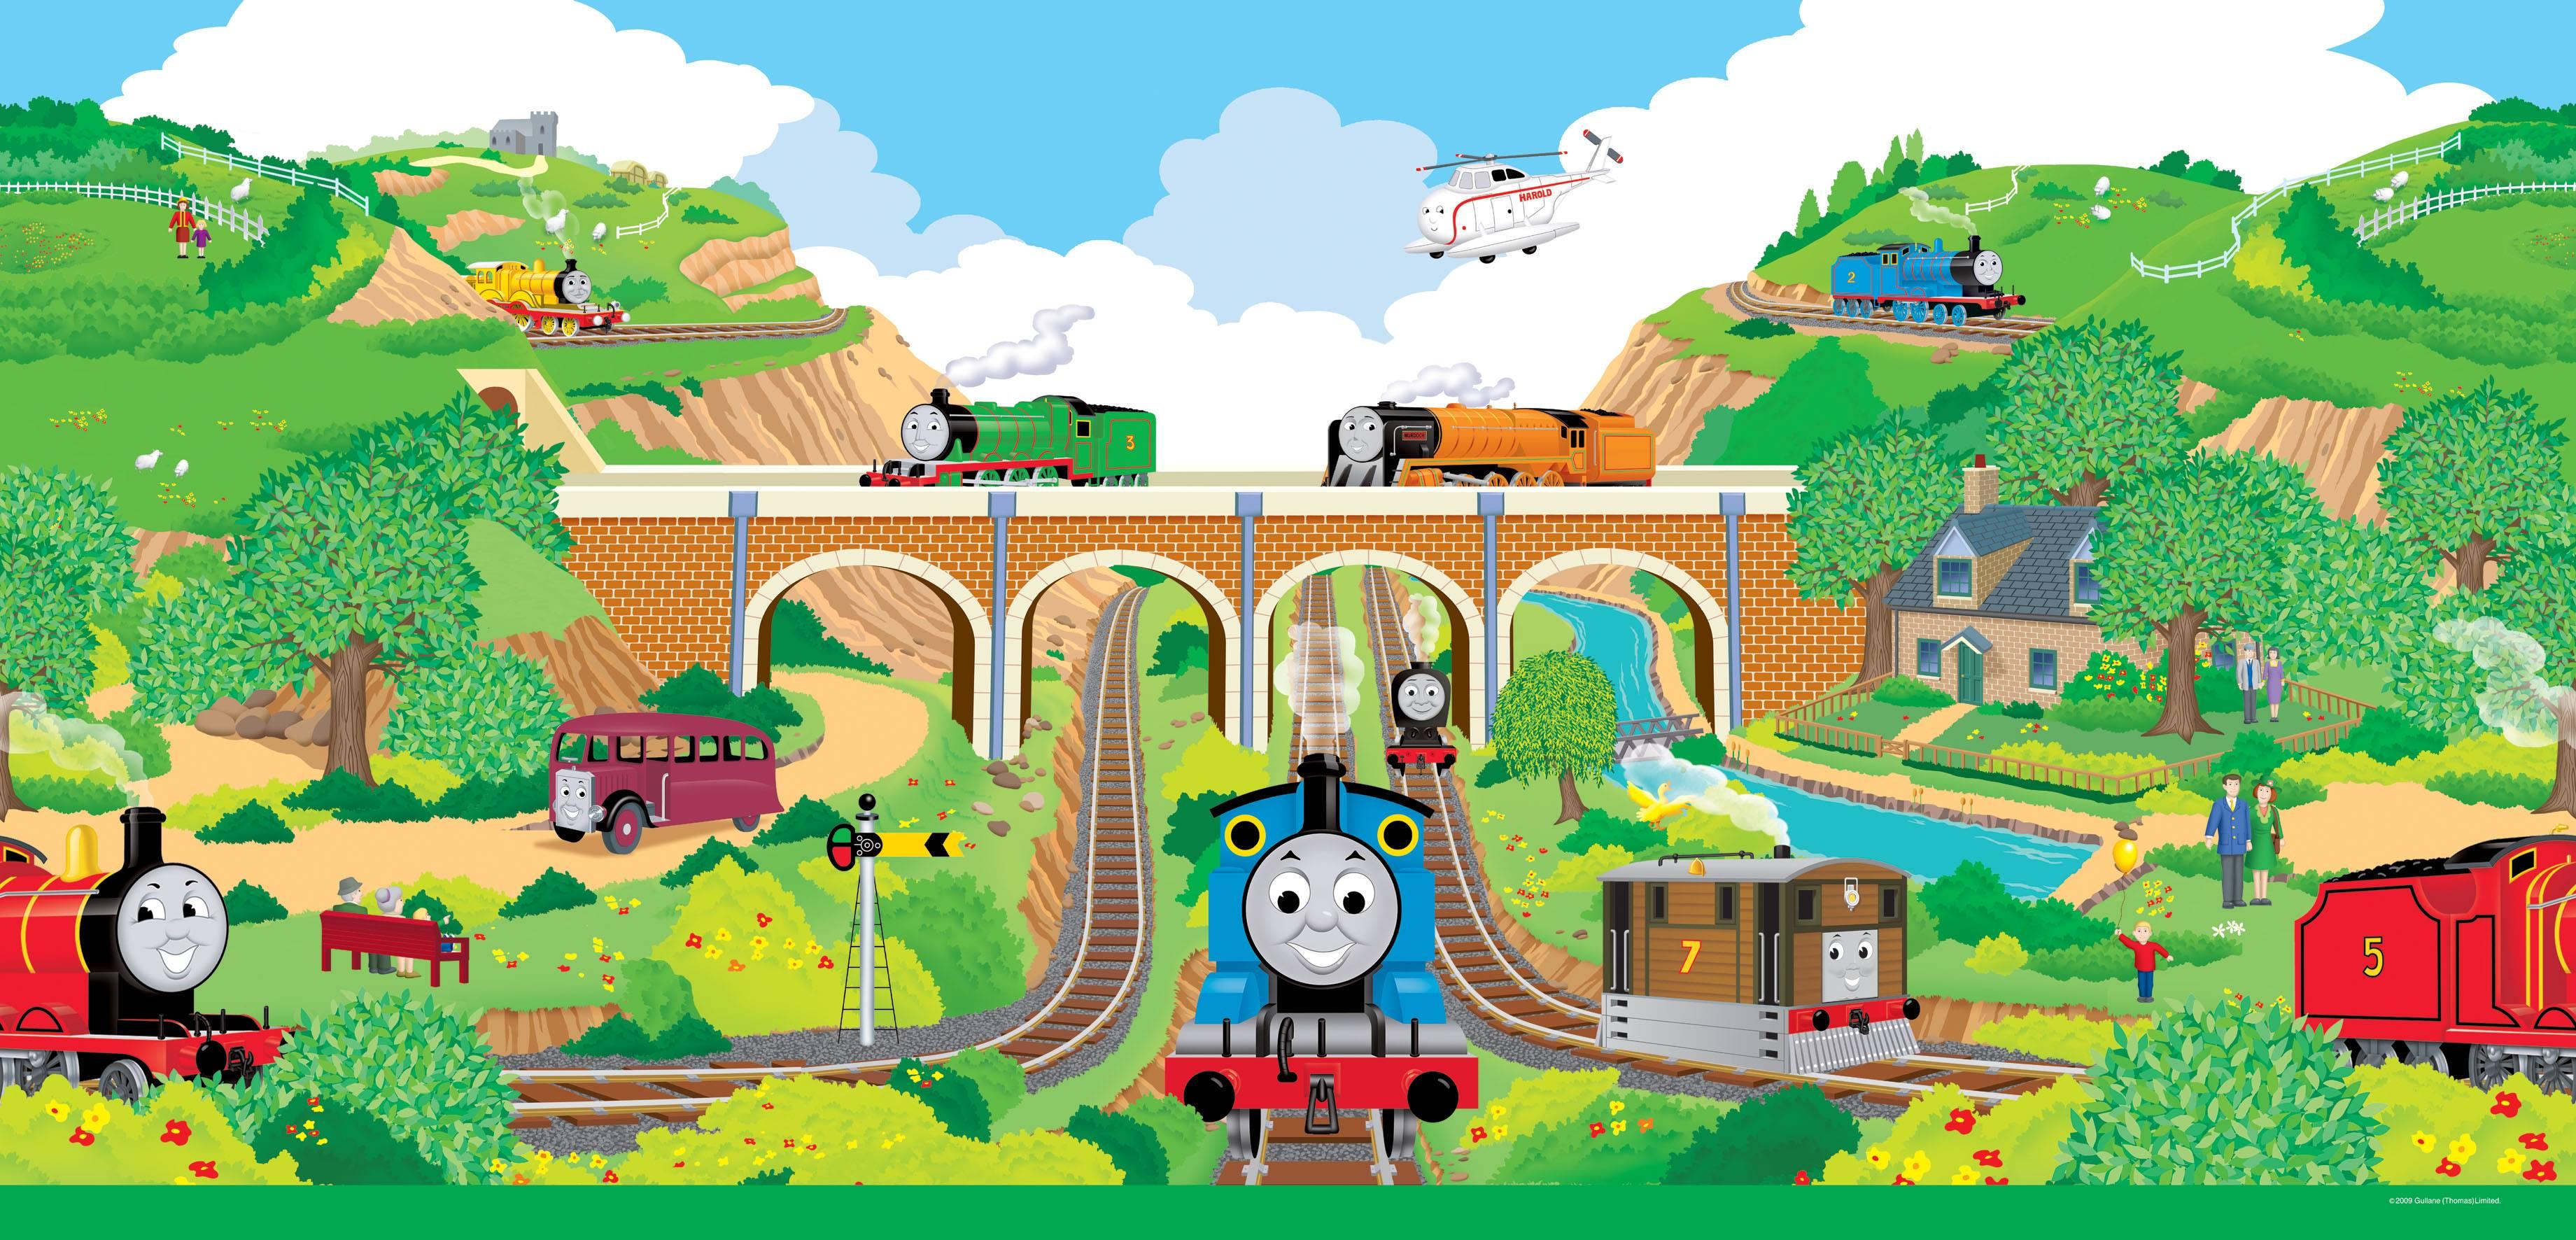 Thomas and Friends Desktop Wallpaper - WallpaperSafari Thomas And Friends Wallpaper Border